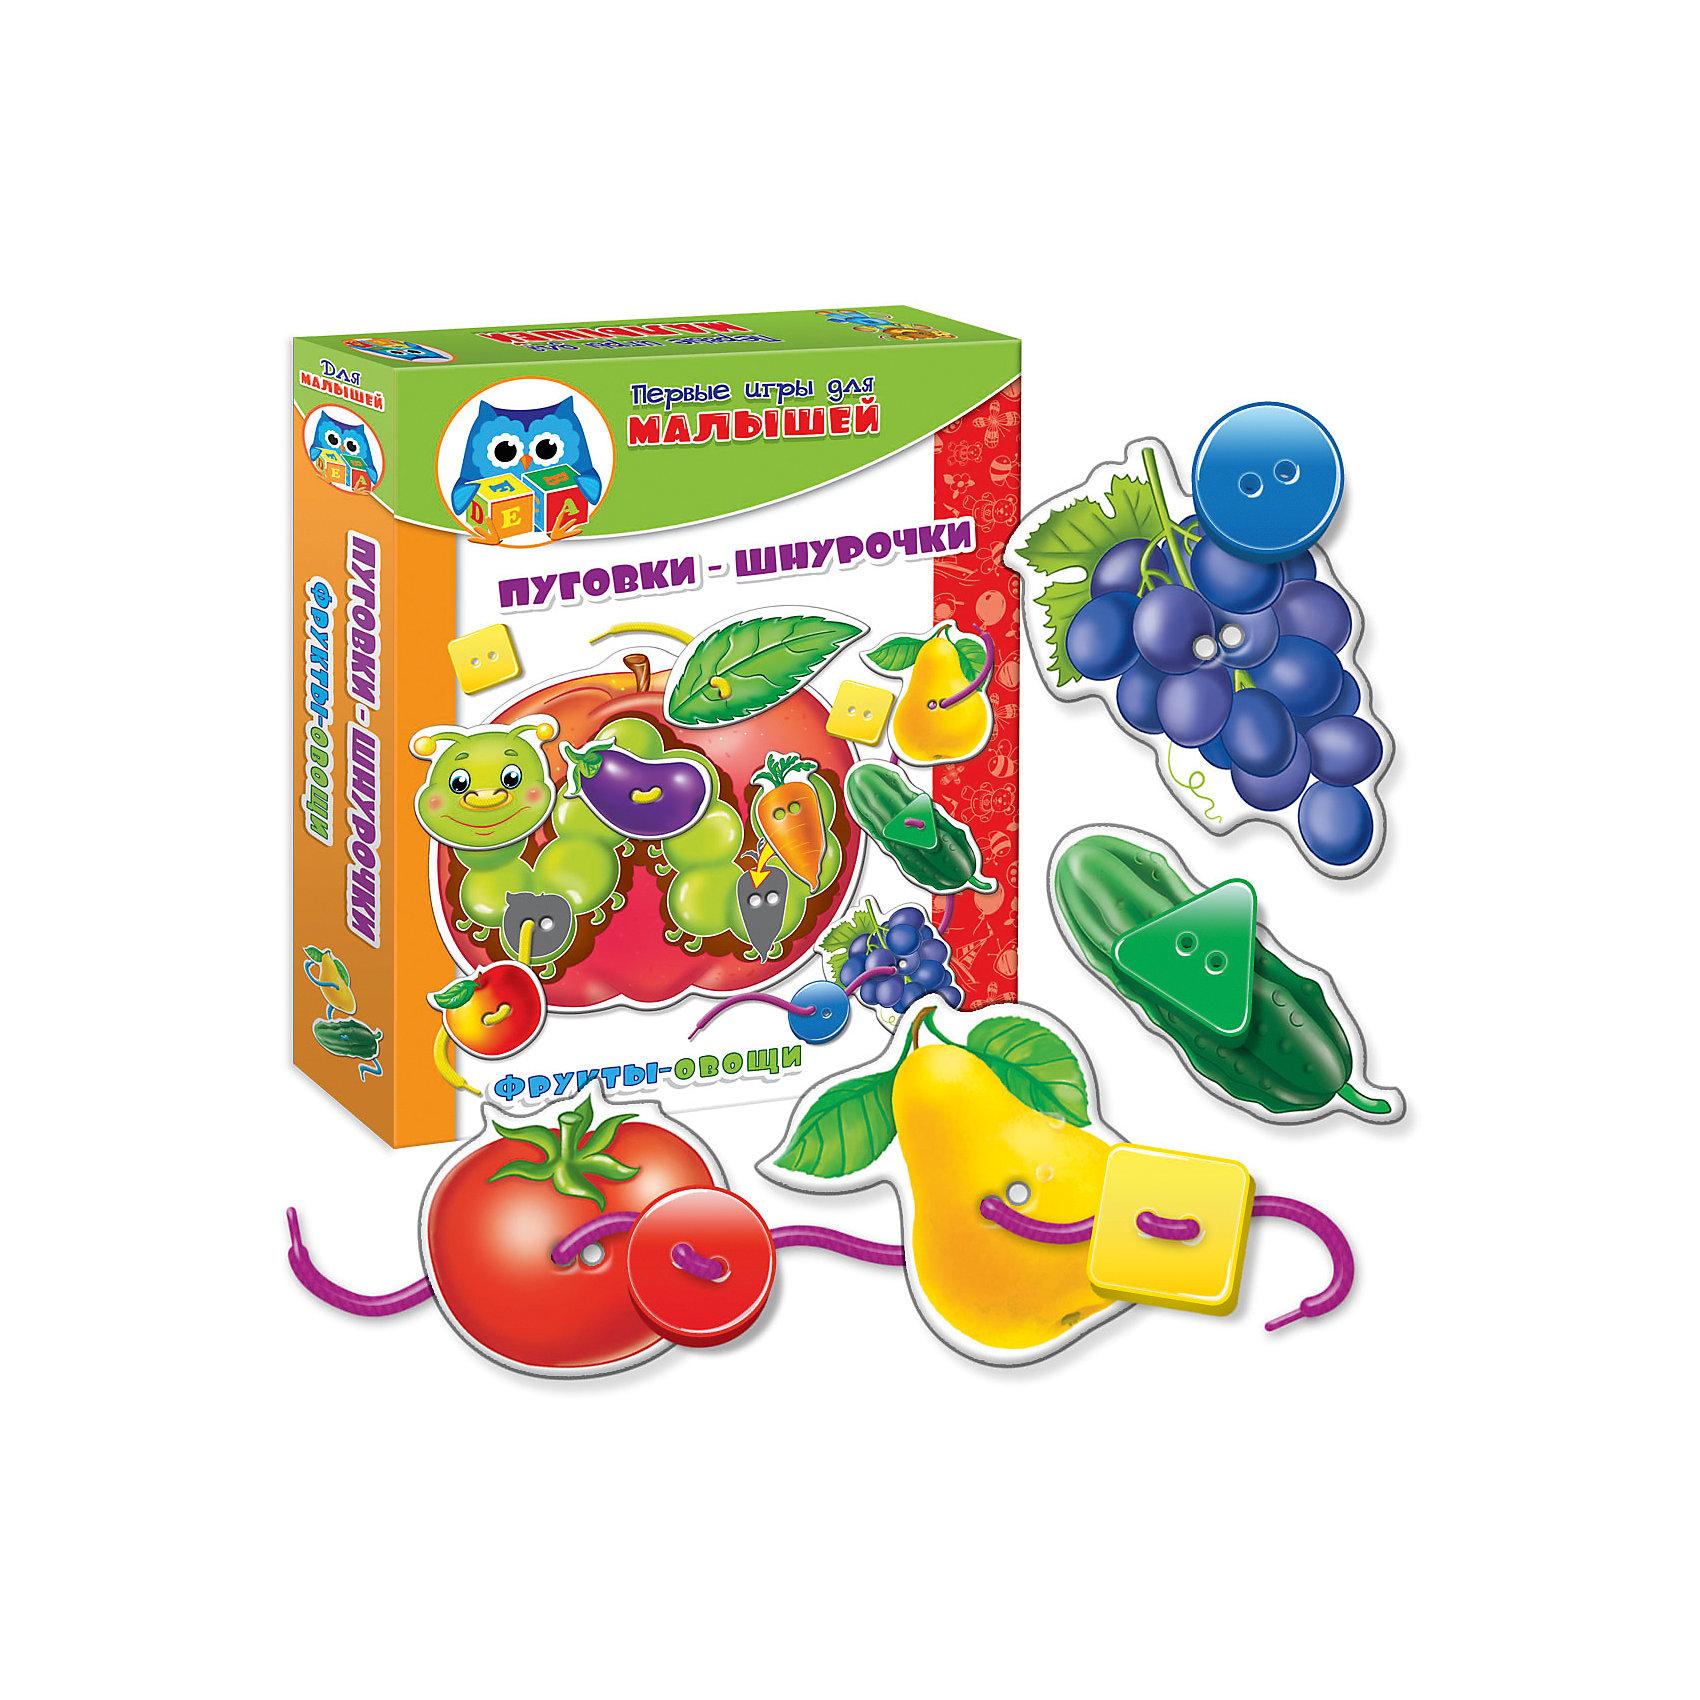 Vladi Toys Набор развивающих игр Фрукты-овощи, Vladi Toys набор для творчества тм vladi раскраски глиттером сова